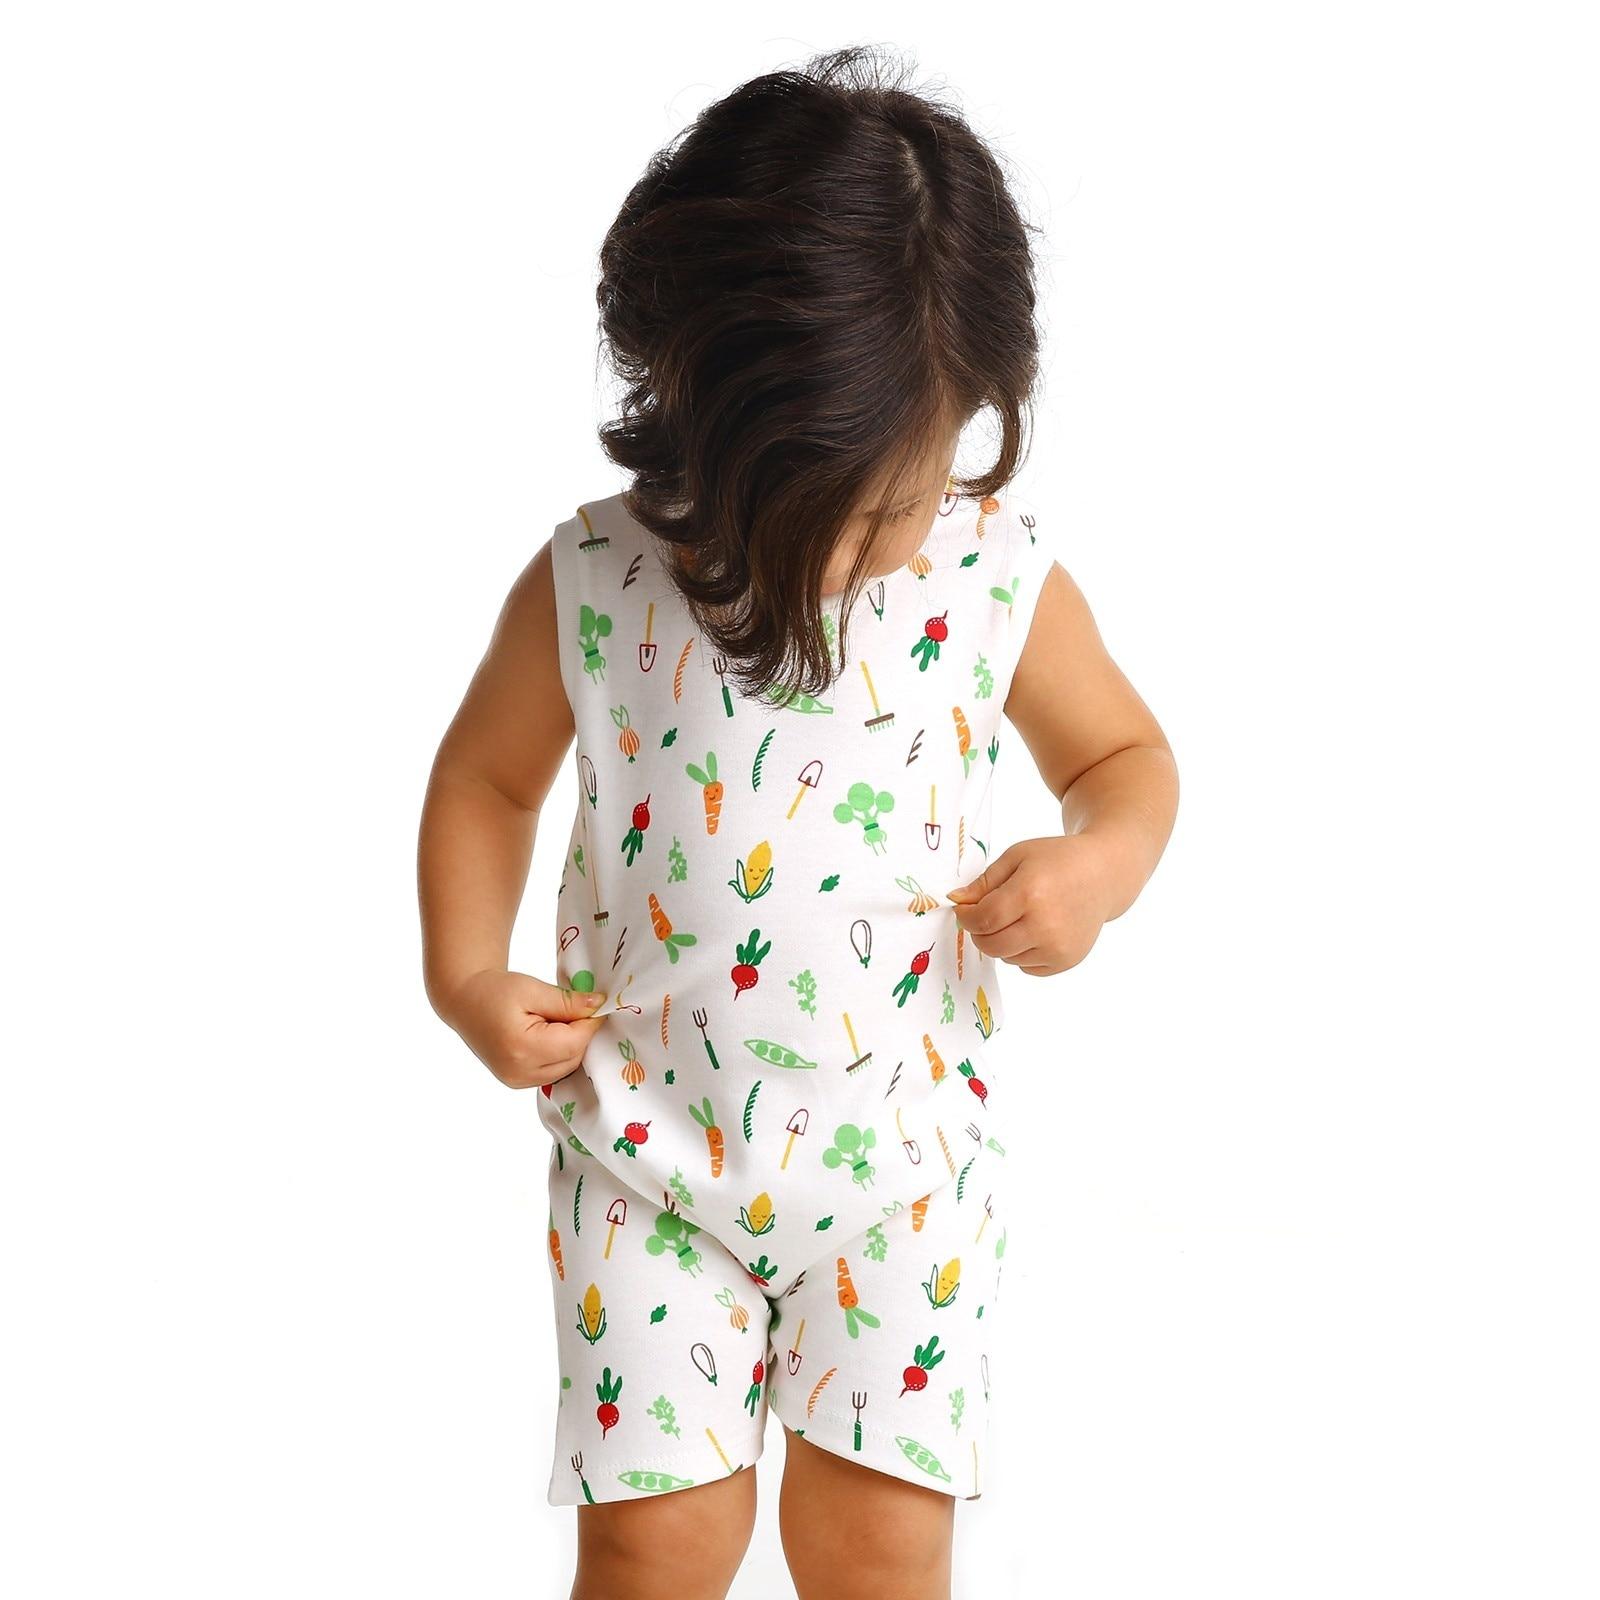 Ebebek HelloBaby Summer Baby Sweet Vegetables Sleeveless Jumpsuit